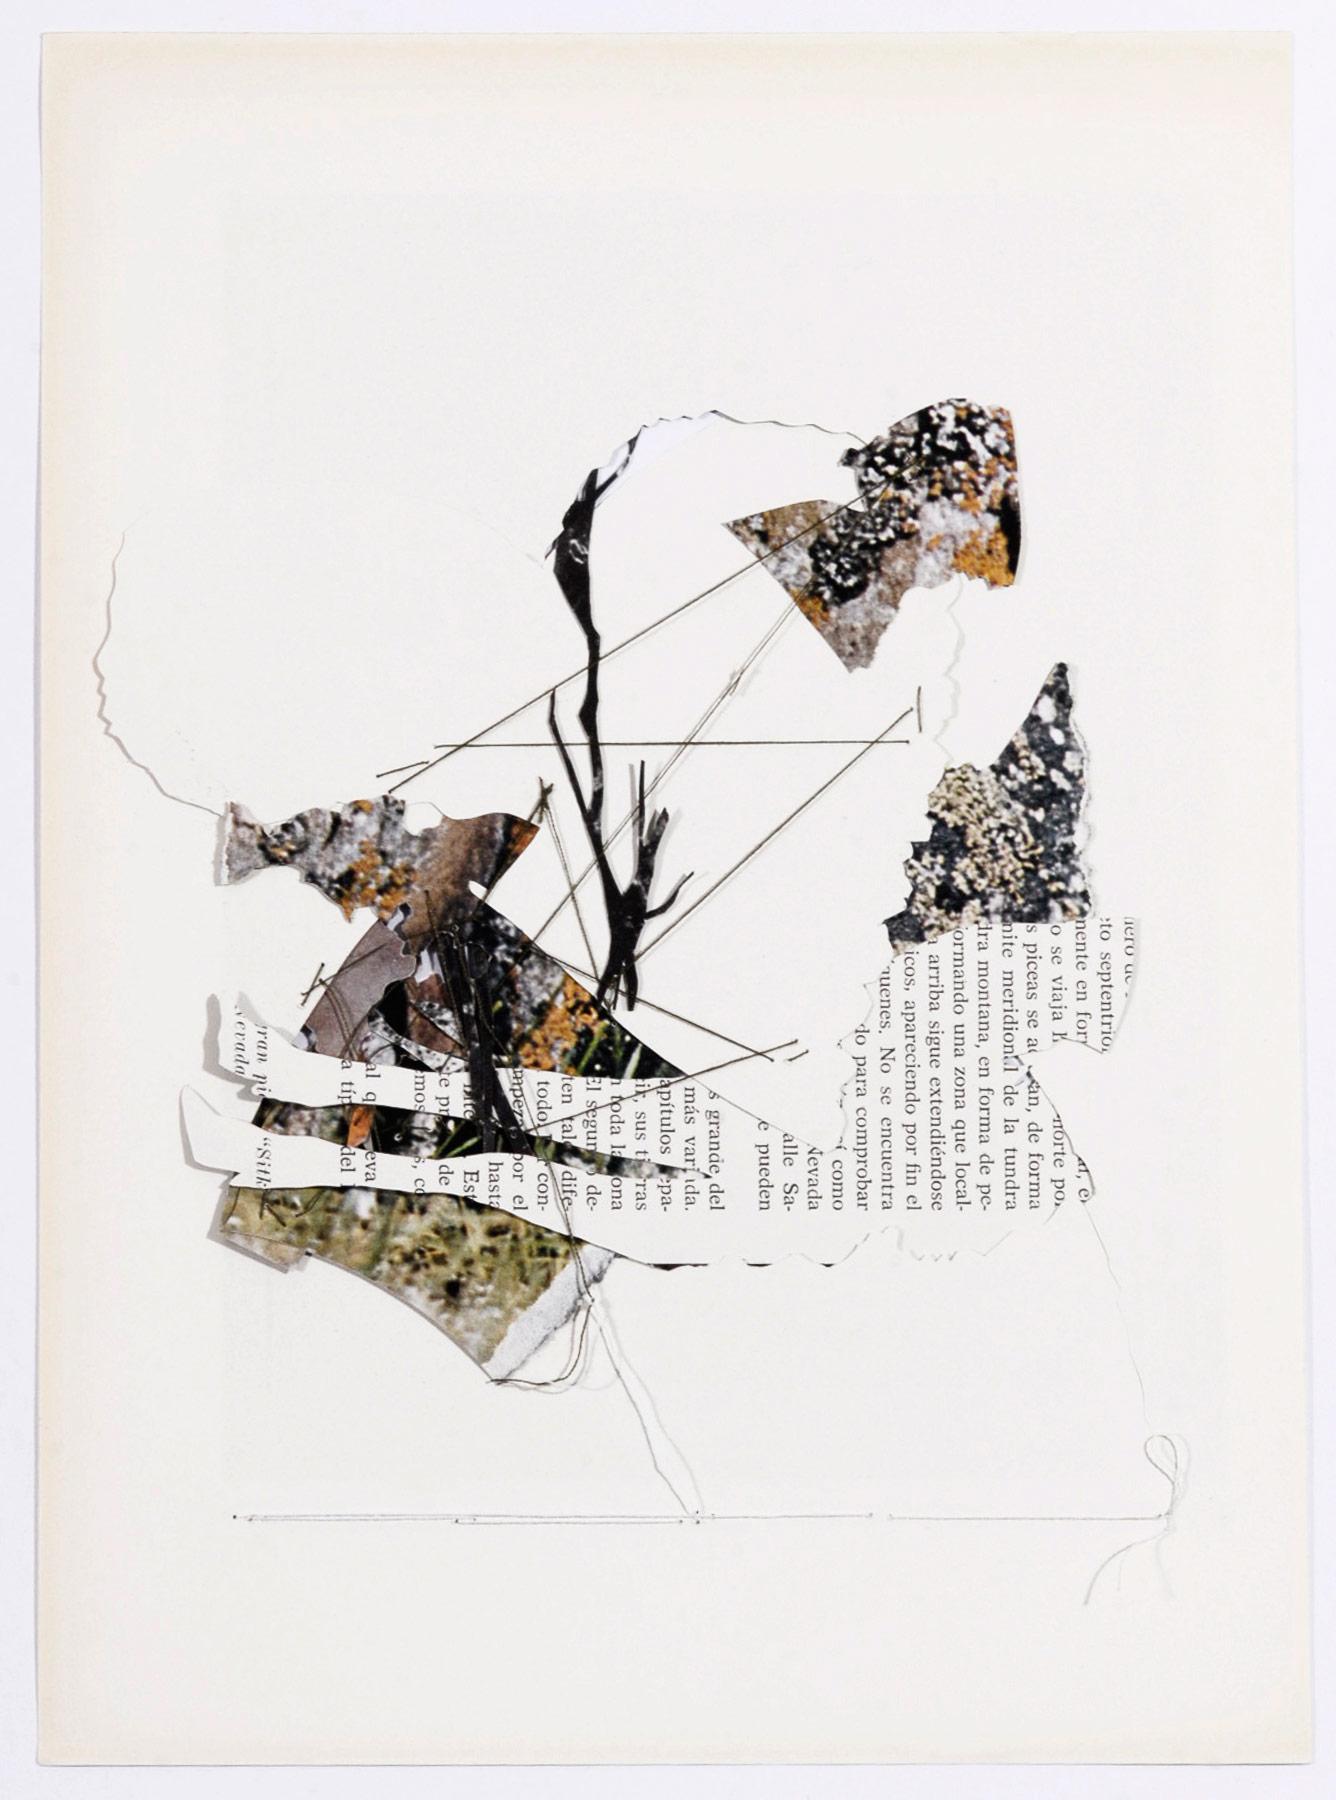 Collage#25, 2010. (Dorso). Collage,papel, hilo. 25 x 19,5 cm.